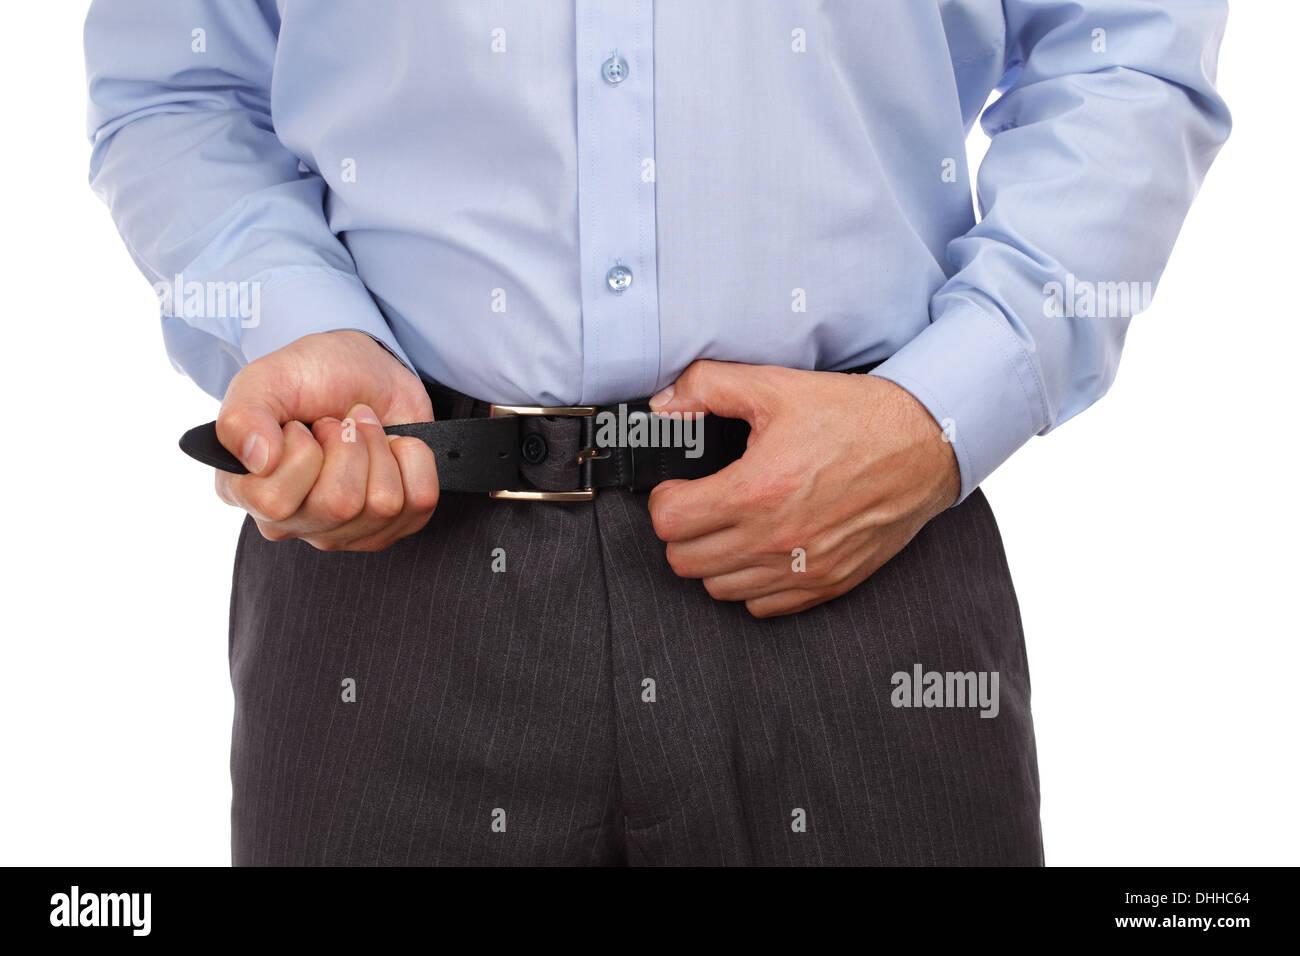 Tightening one's belt - Stock Image